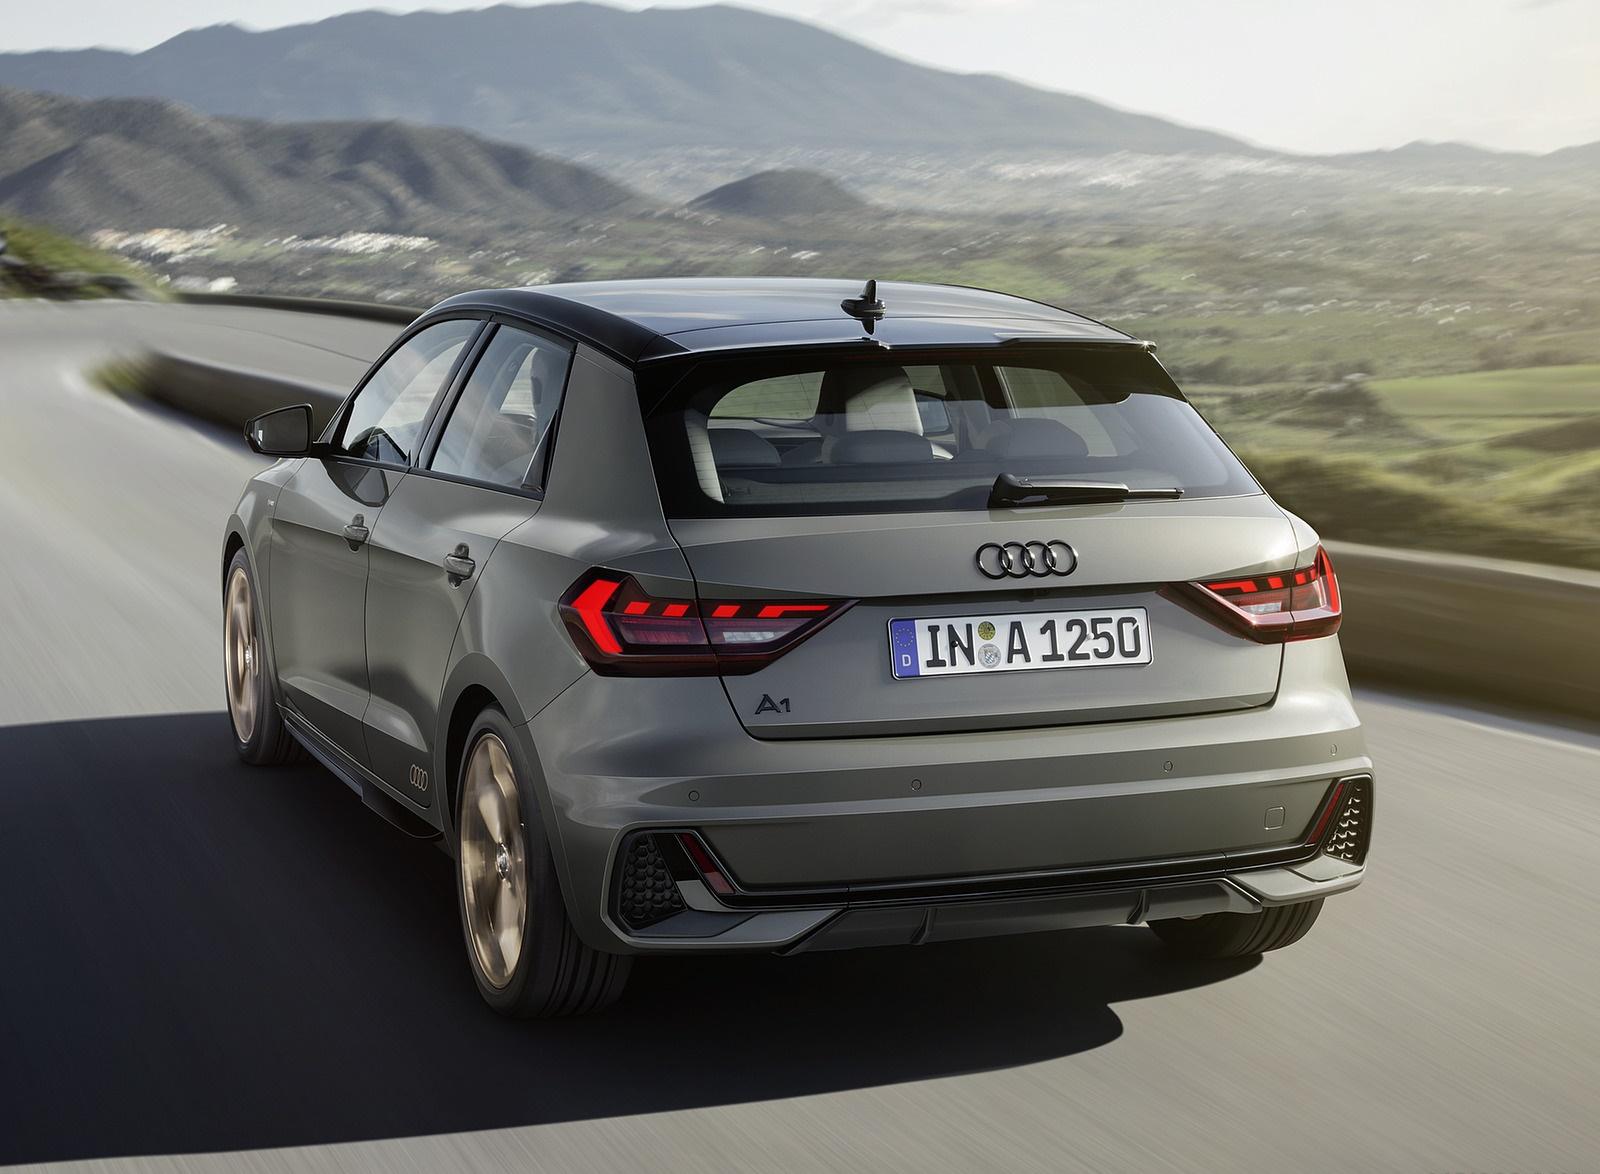 2019 Audi A1 Sportback (Color: Chronos Grey) Rear Wallpapers (8)